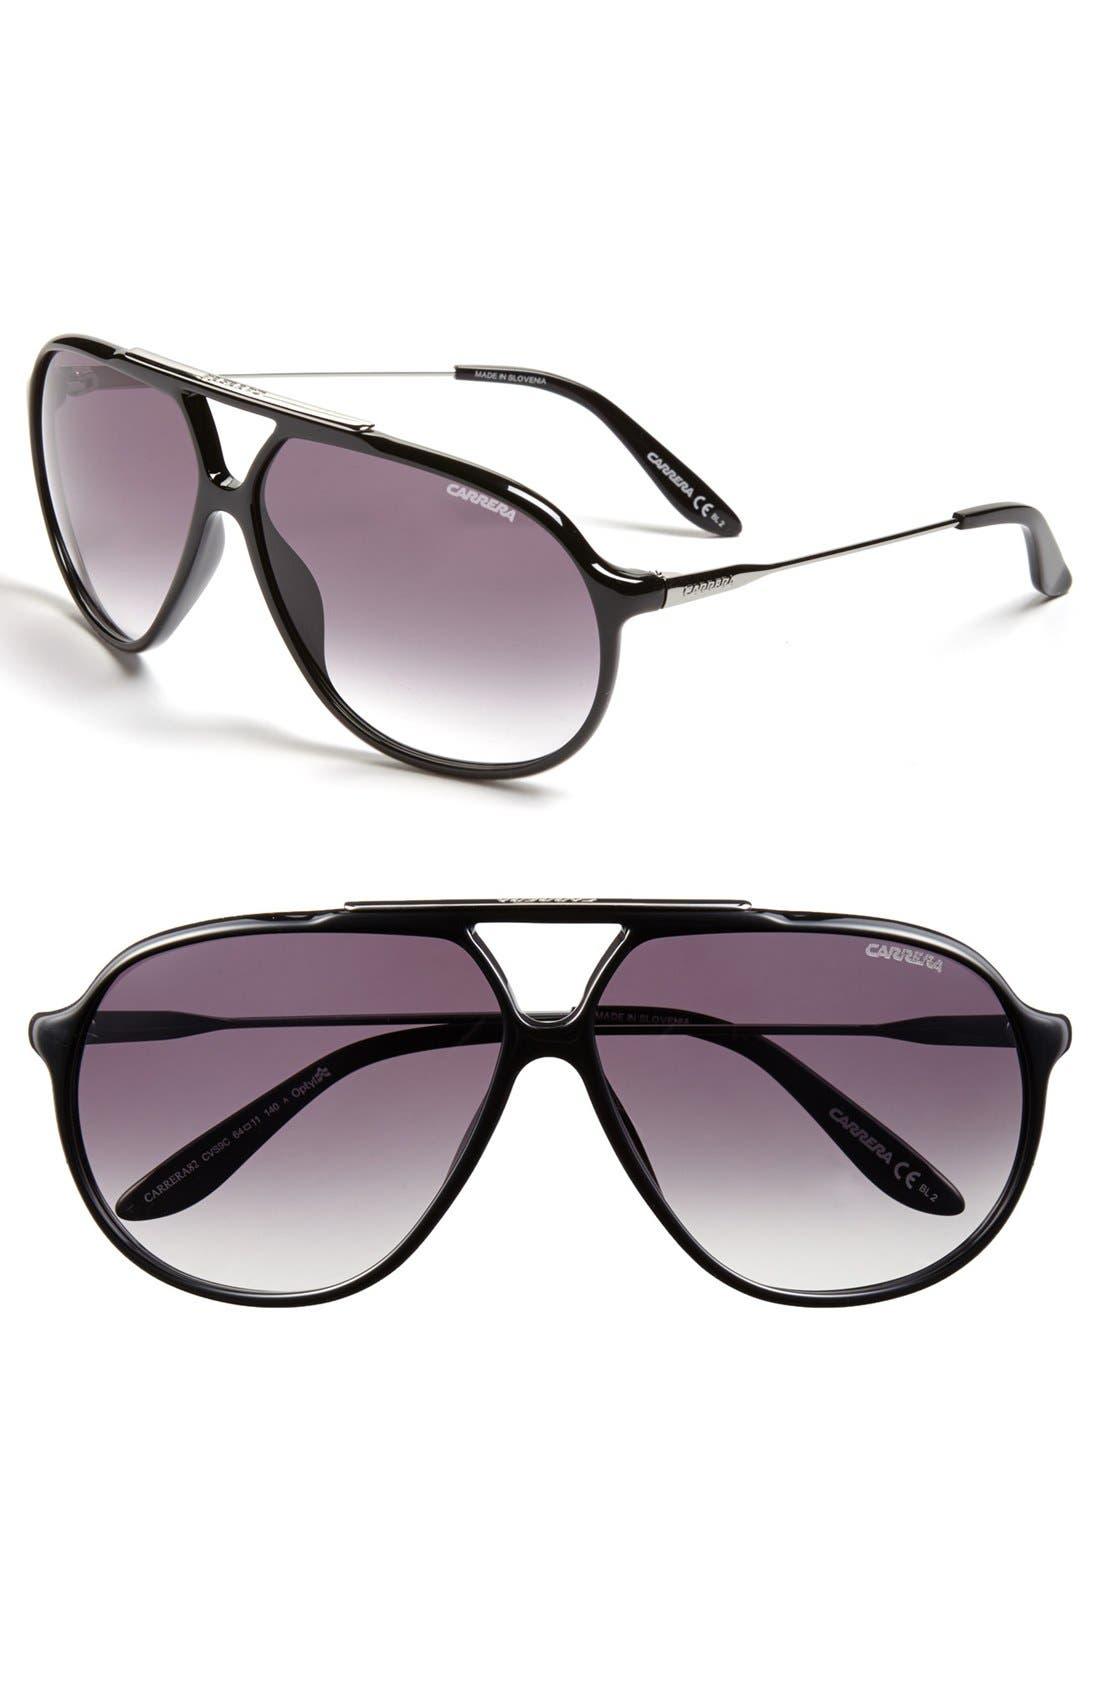 Alternate Image 1 Selected - Carrera Eyewear 64mm Aviator Sunglasses